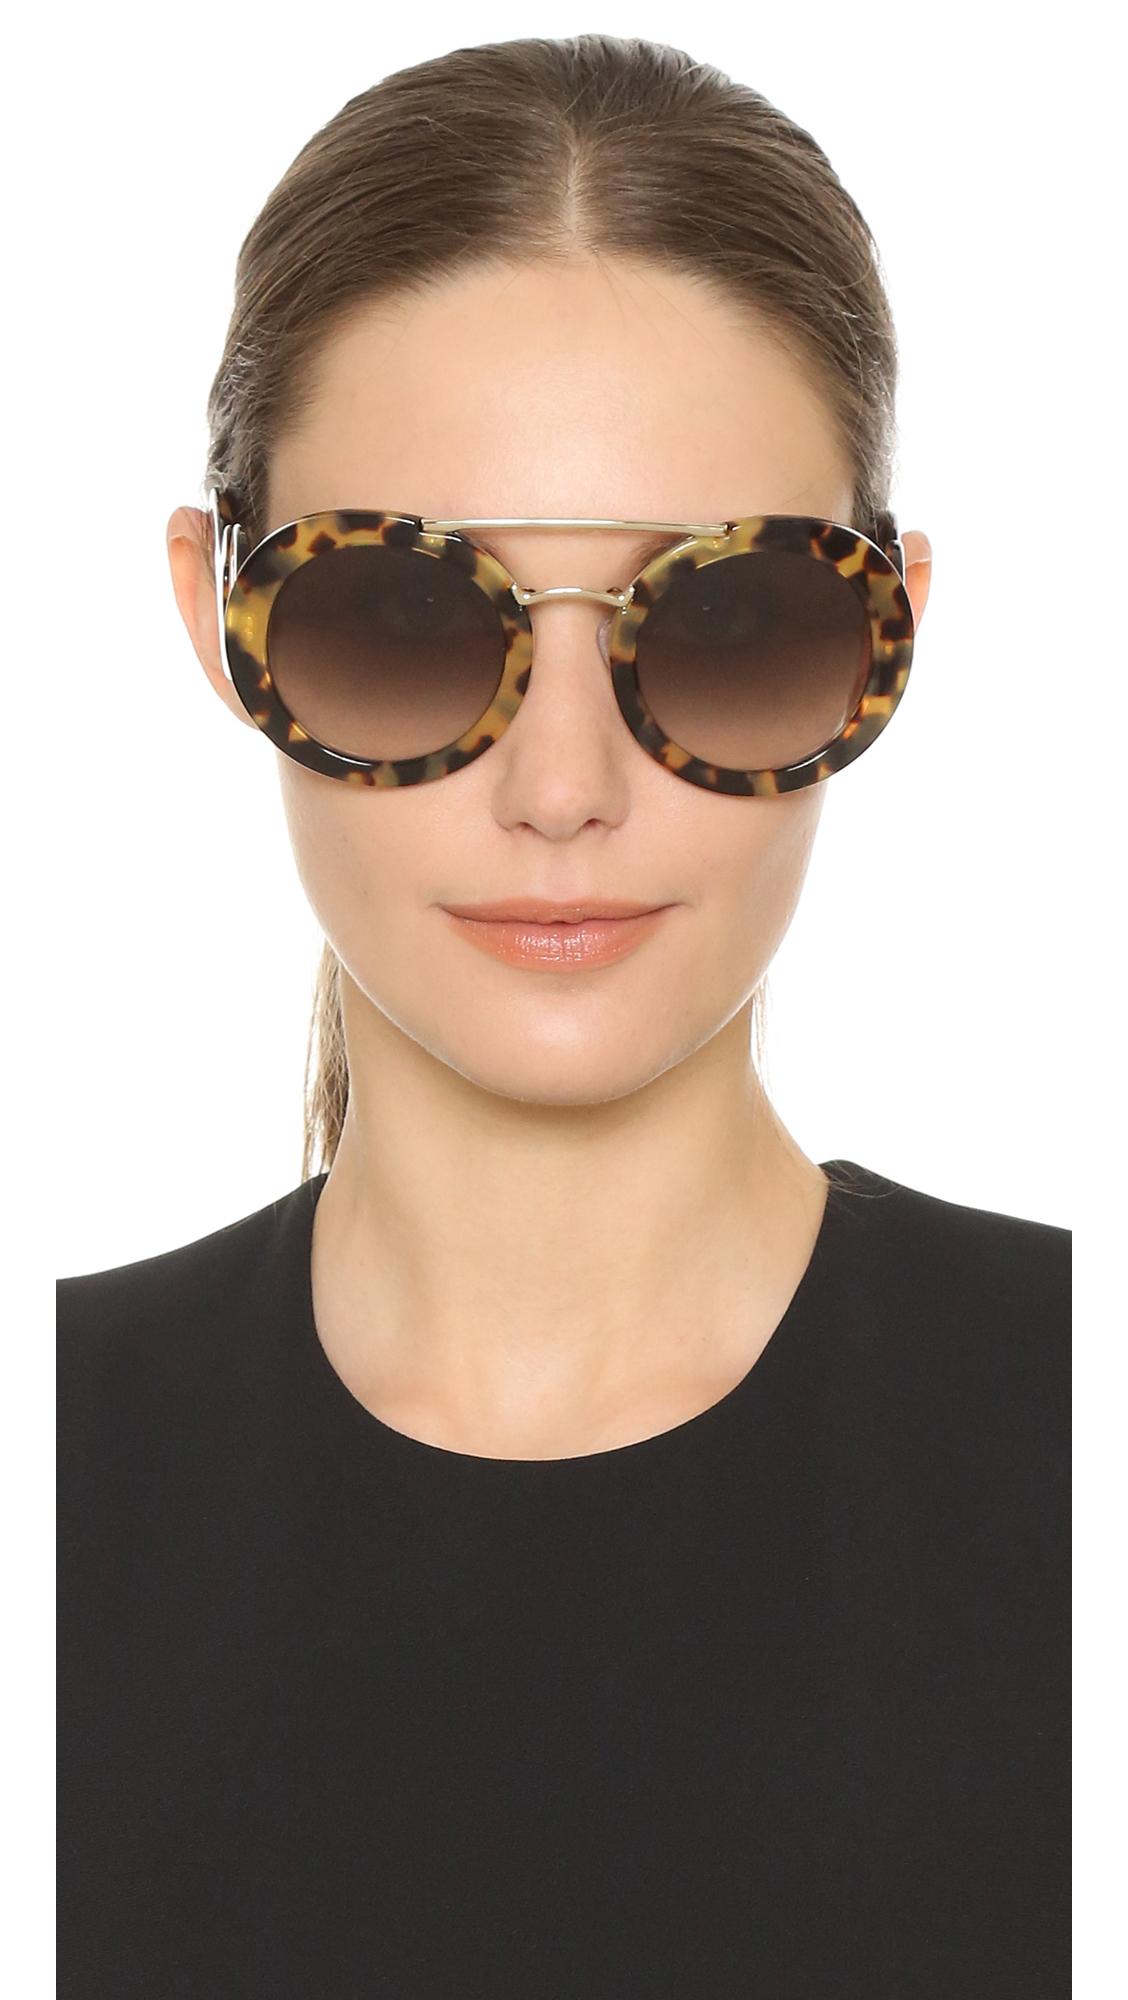 4c69b4cd54 Lyst - Prada Catwalk Oversized Sunglasses in Gray